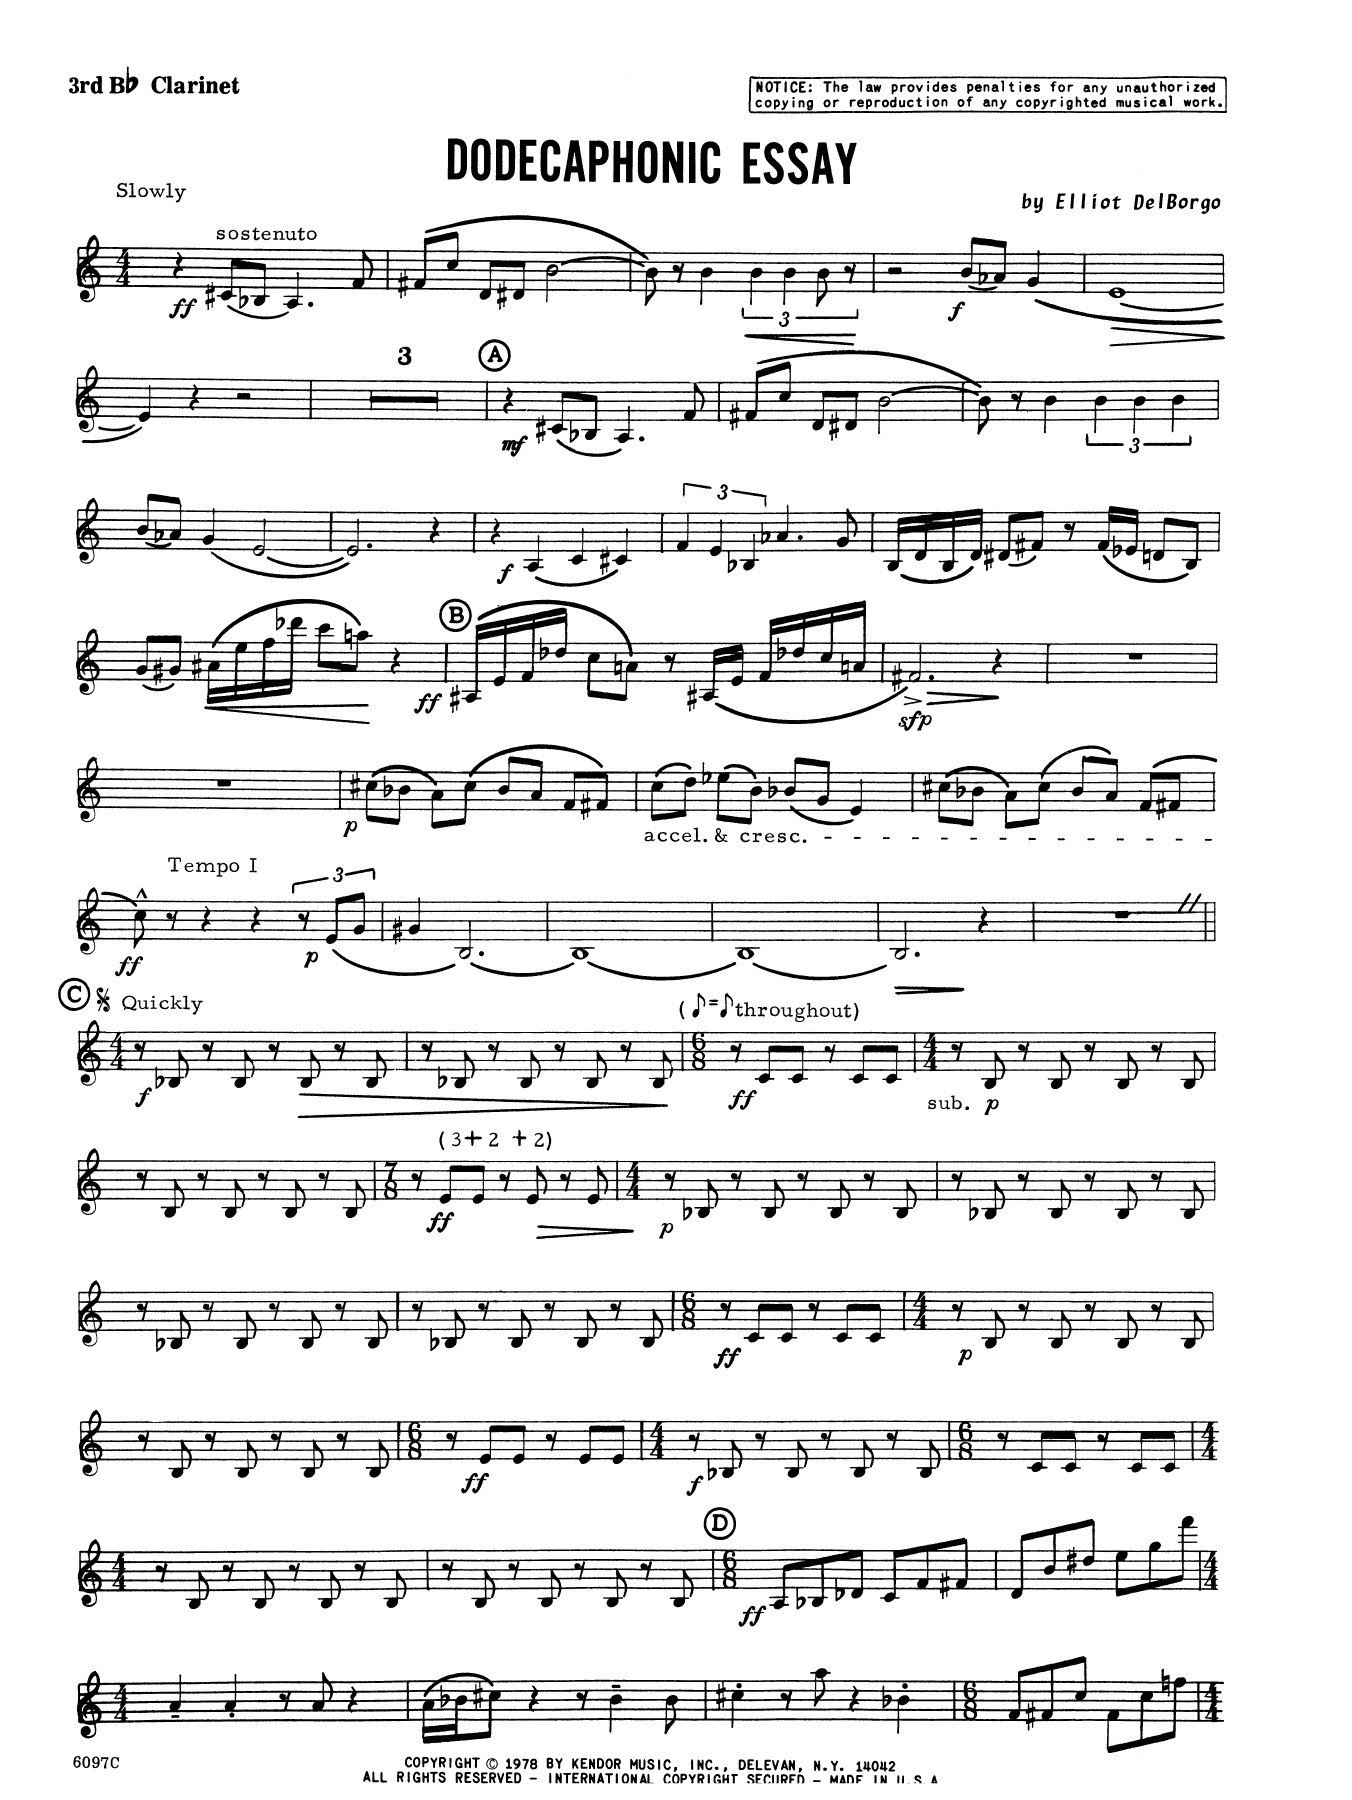 Dodecaphonic Essay - 3rd Bb Clarinet Sheet Music